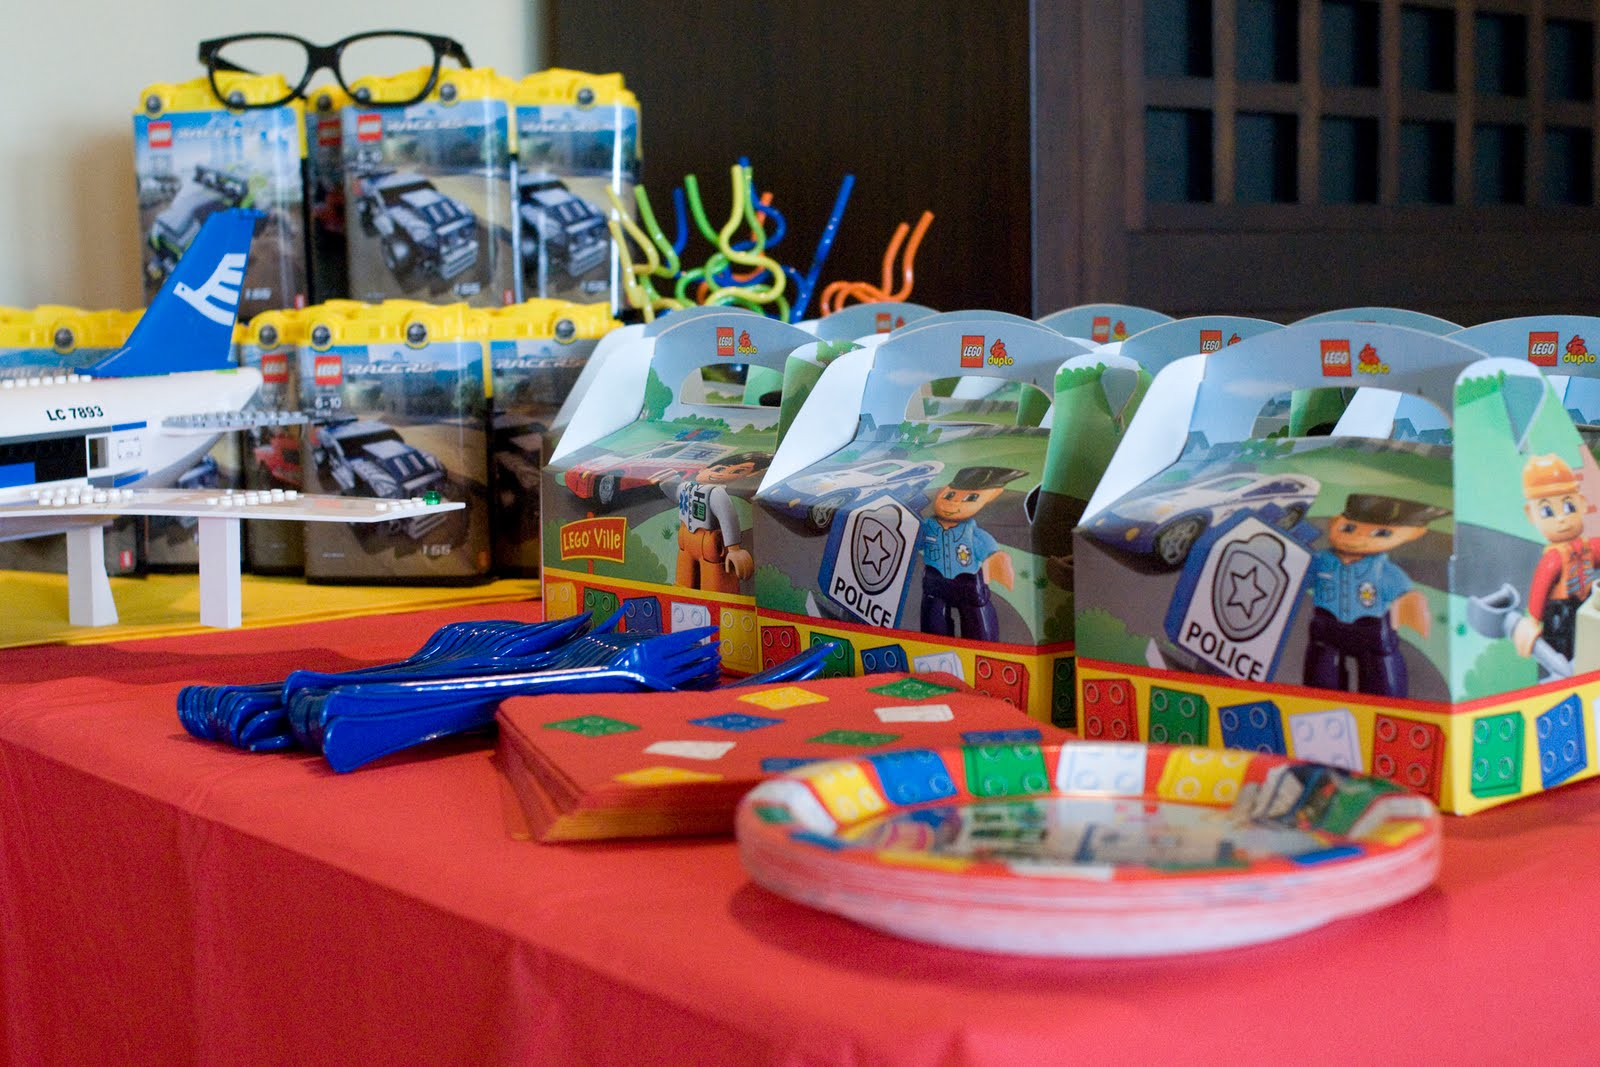 & Lego Birthday Party... - The Polkadot Chair